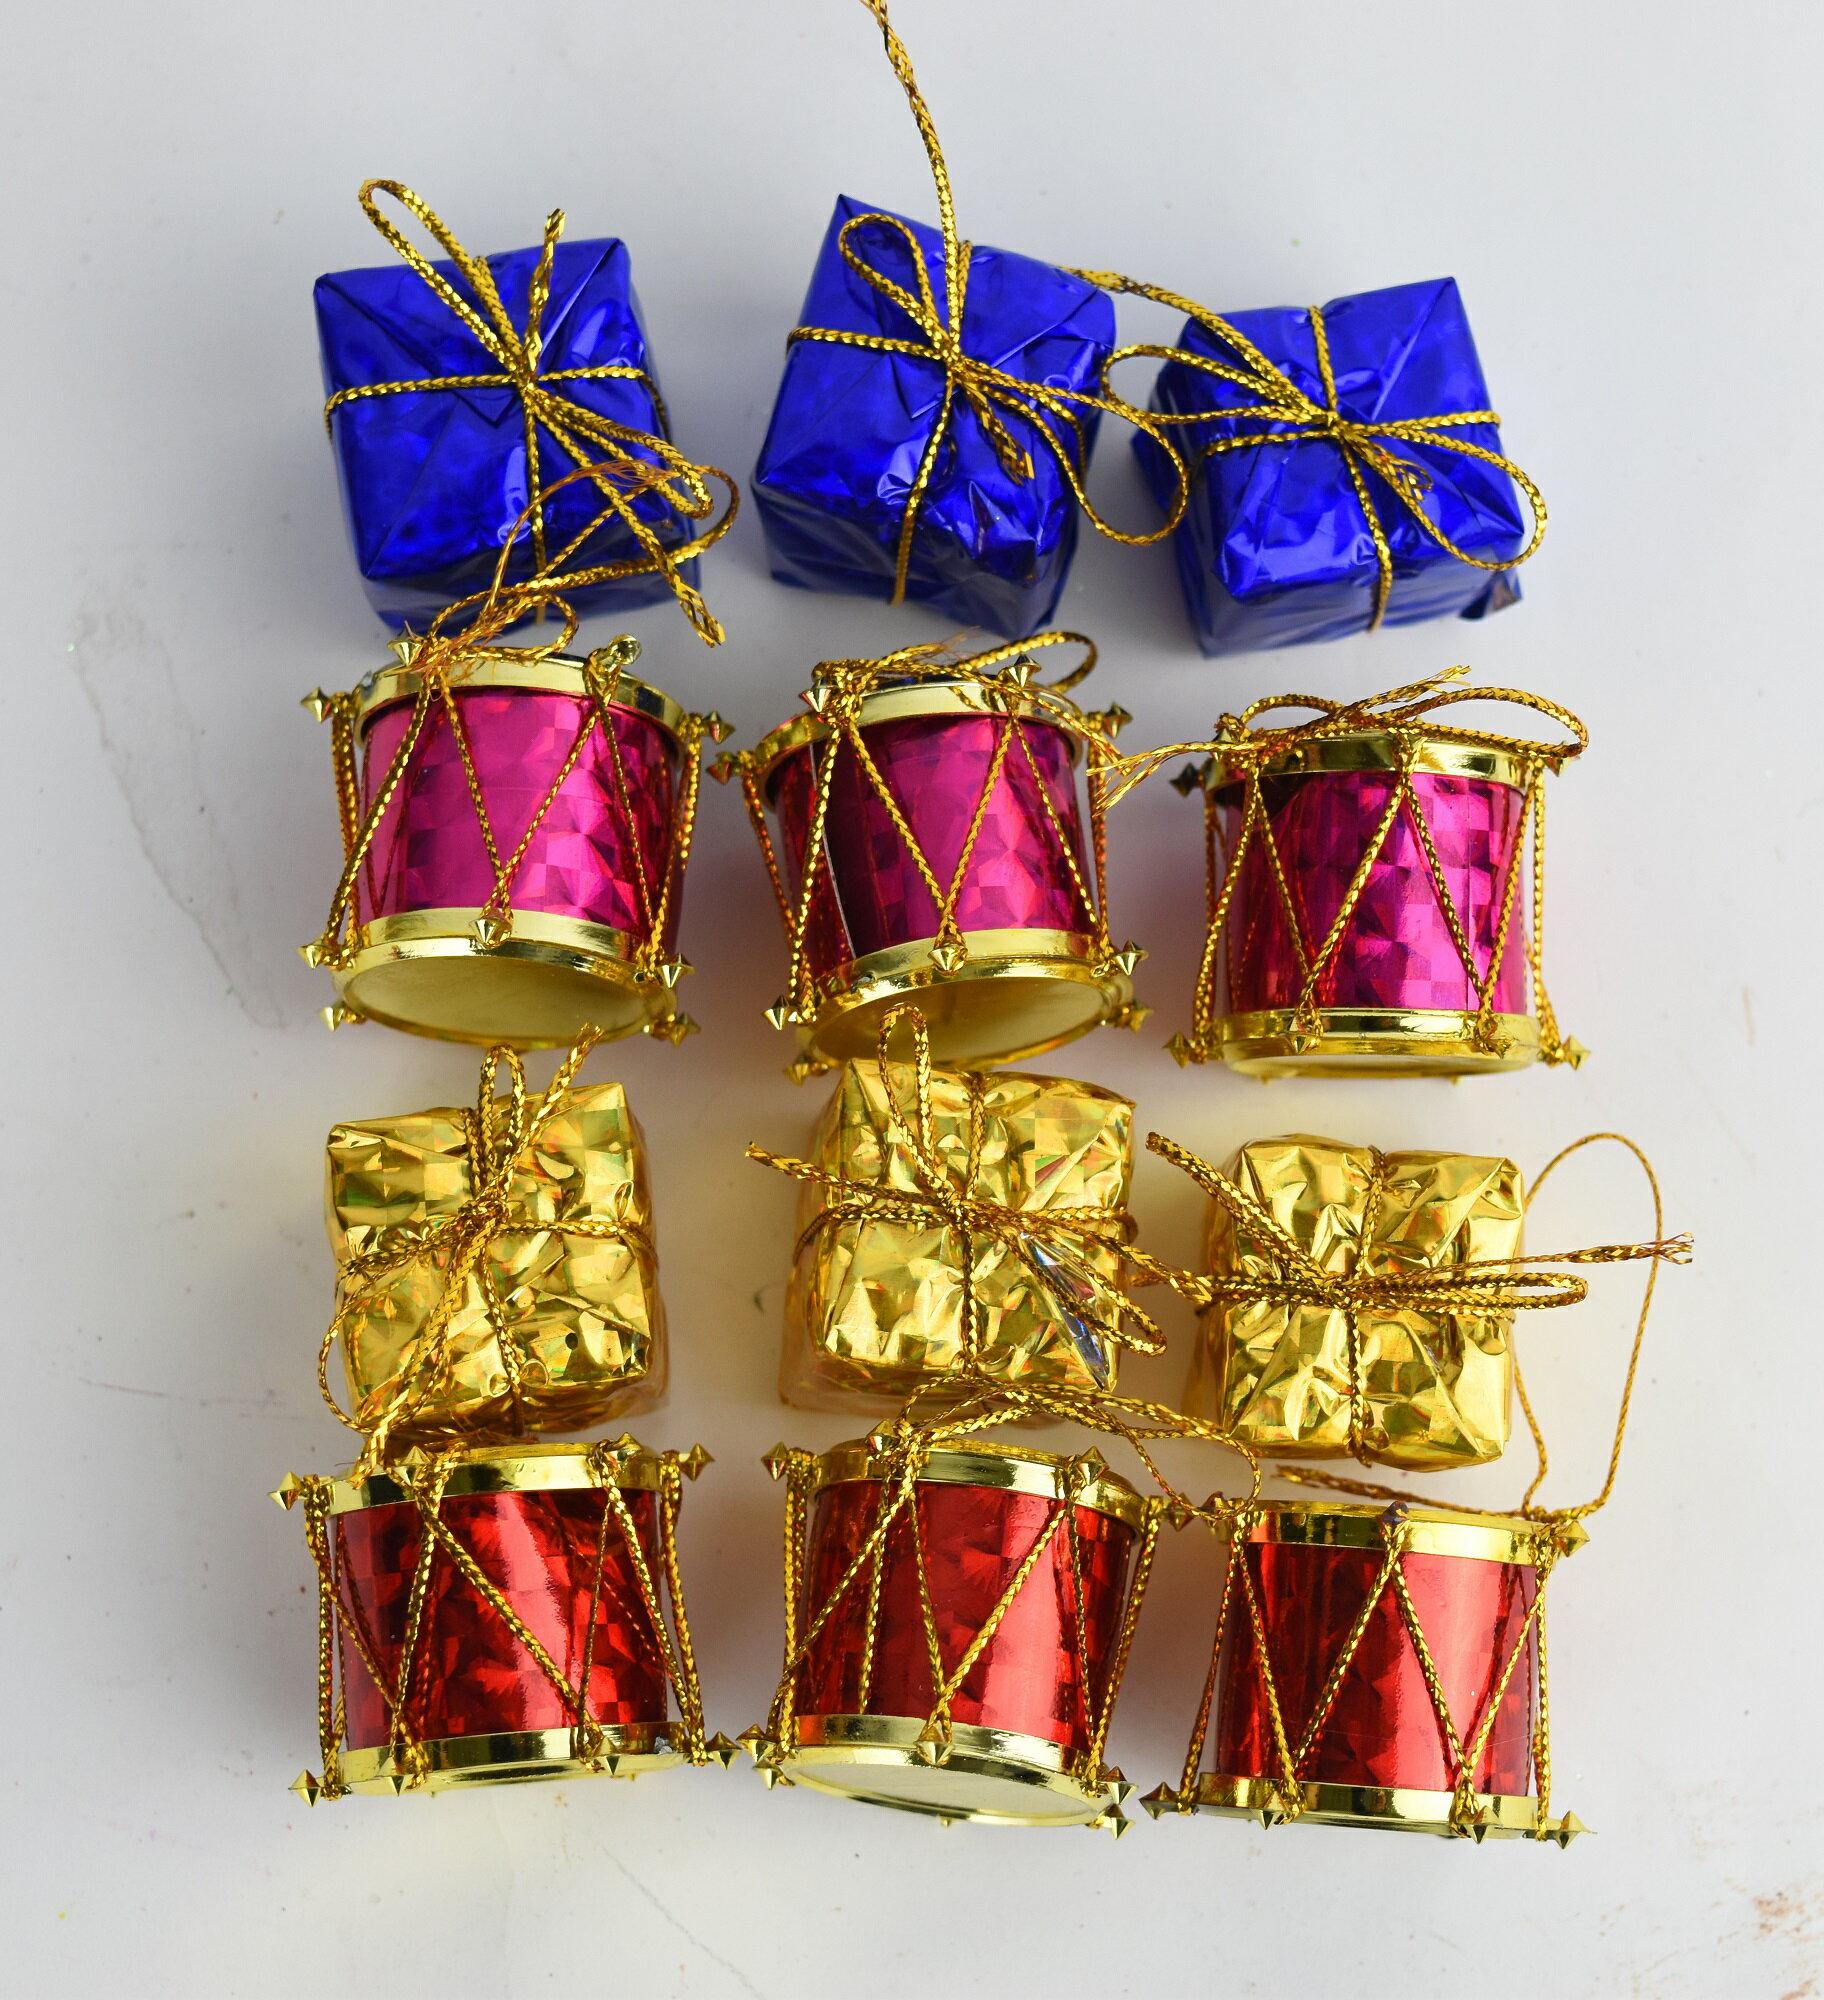 X射線【X381904】3cm禮物鼓(12入),聖誕/聖誕佈置/裝飾/吊飾/會場佈置/DIY/材料包/交換禮物